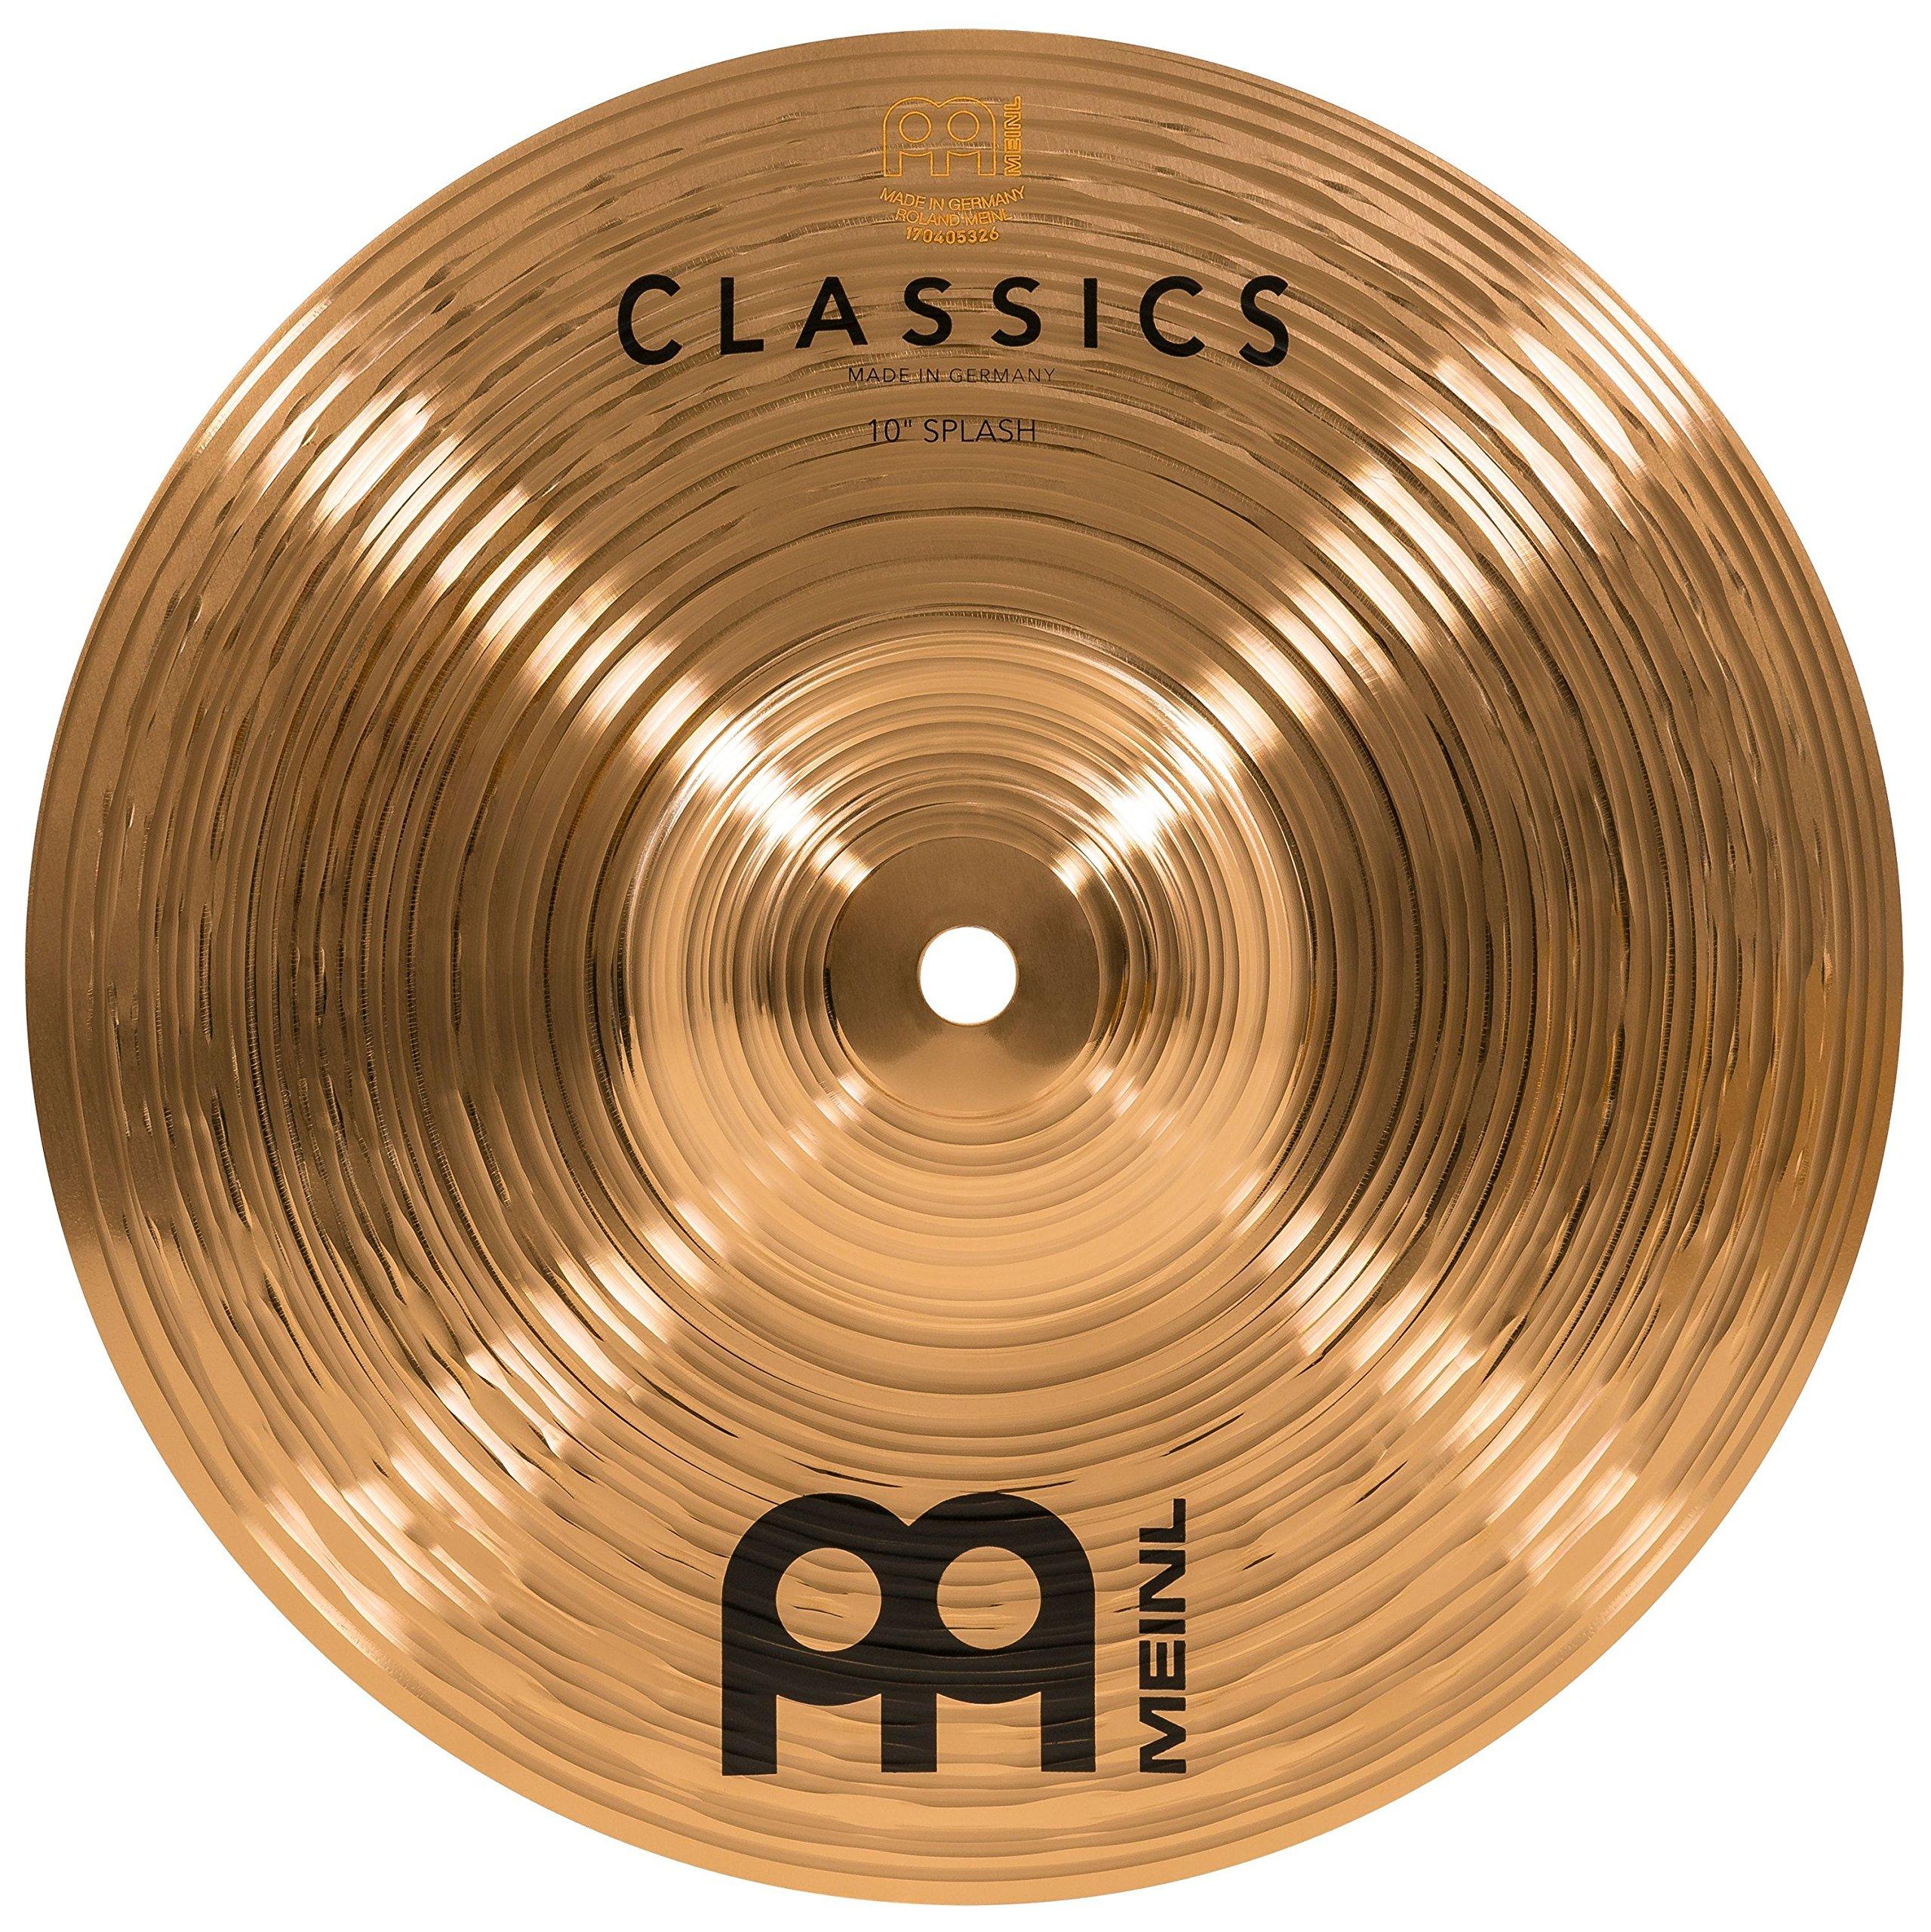 Meinl 10'' Splash Cymbal - Classics Traditional - Made in Germany, 2-YEAR WARRANTY (C10S)